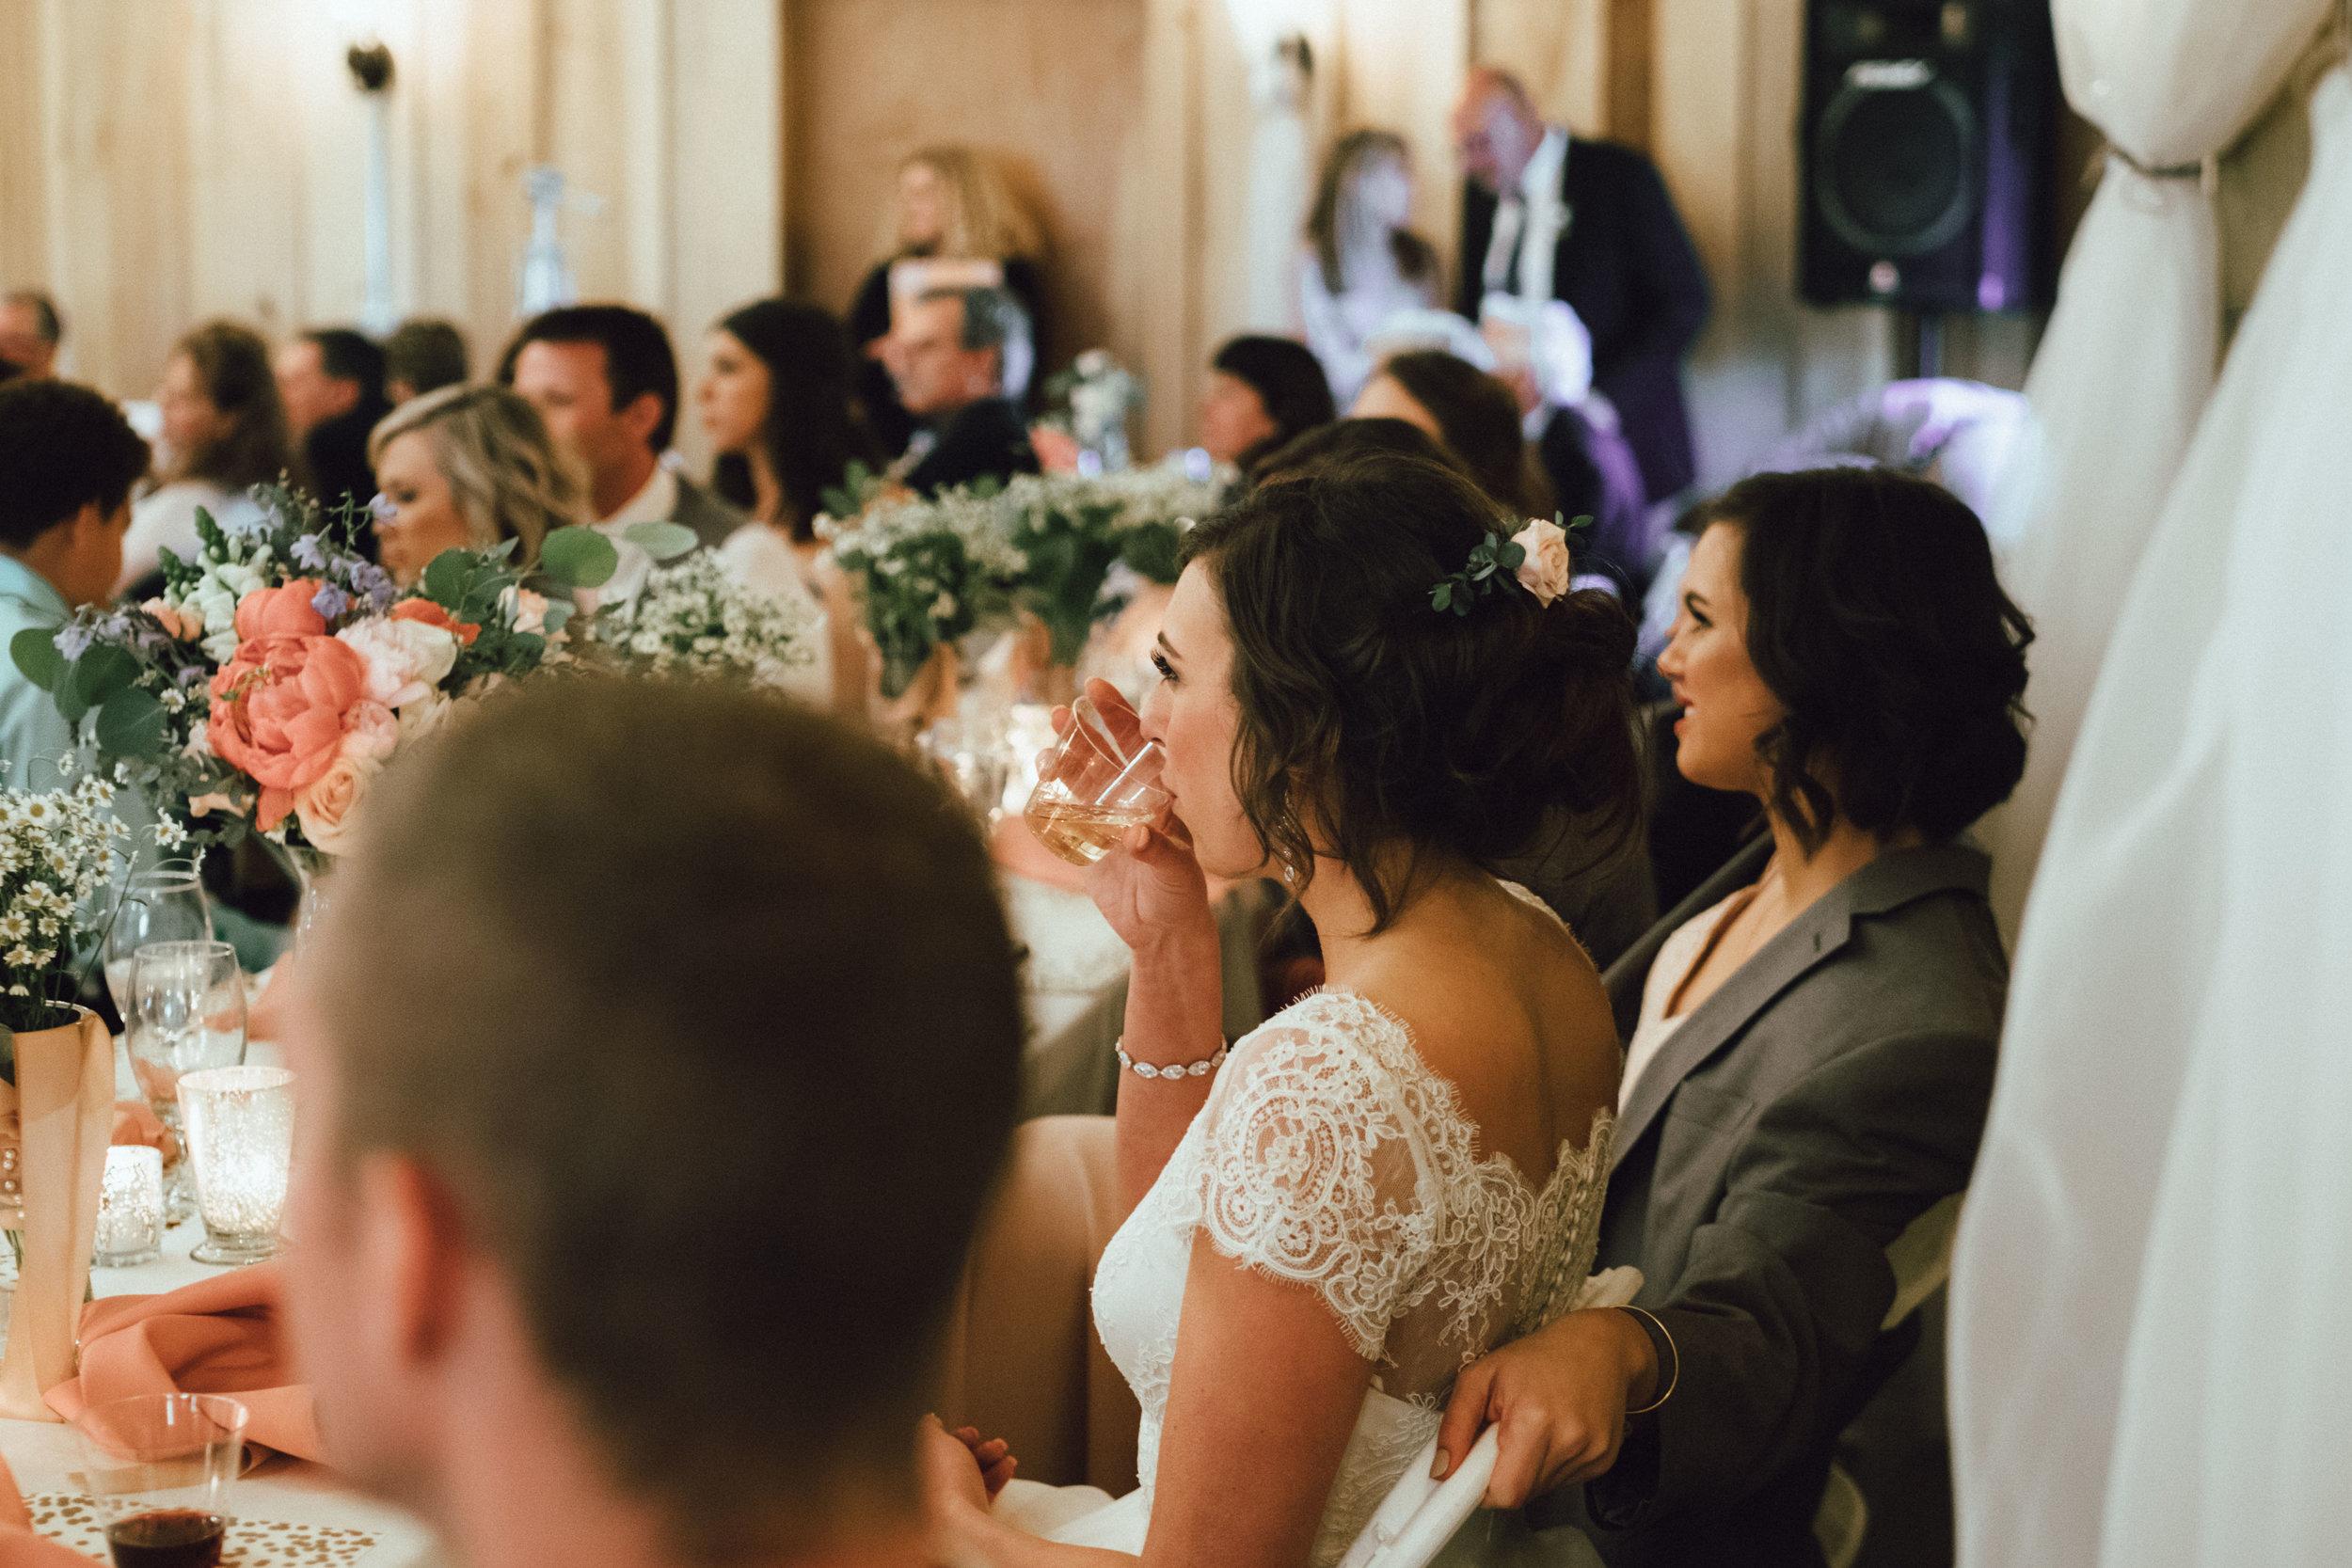 Steph-Ben-Blog-Indianapolis-Wedding-67.jpg